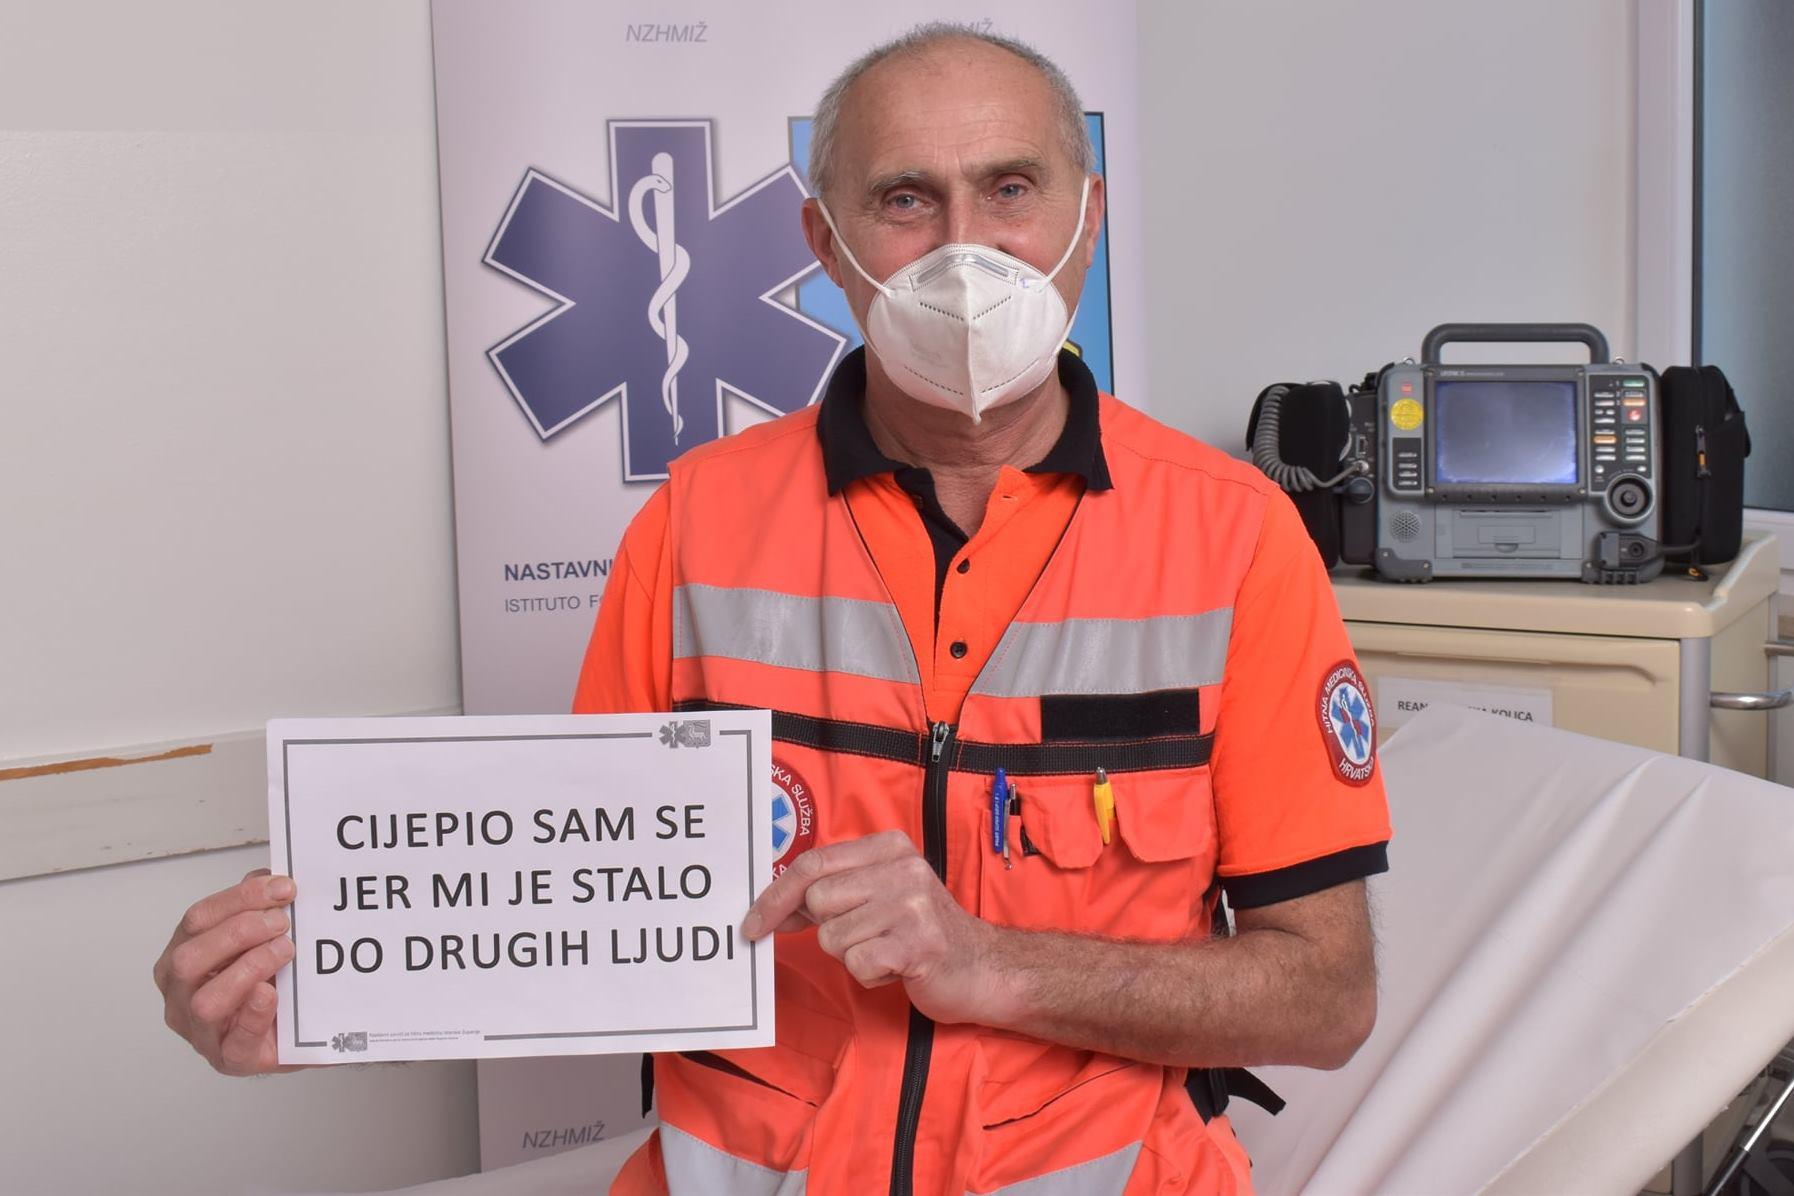 https://novigrad.hr/meu_prvim_cijepljenima_protiv_covida_i_novigraanin_zoran_sari